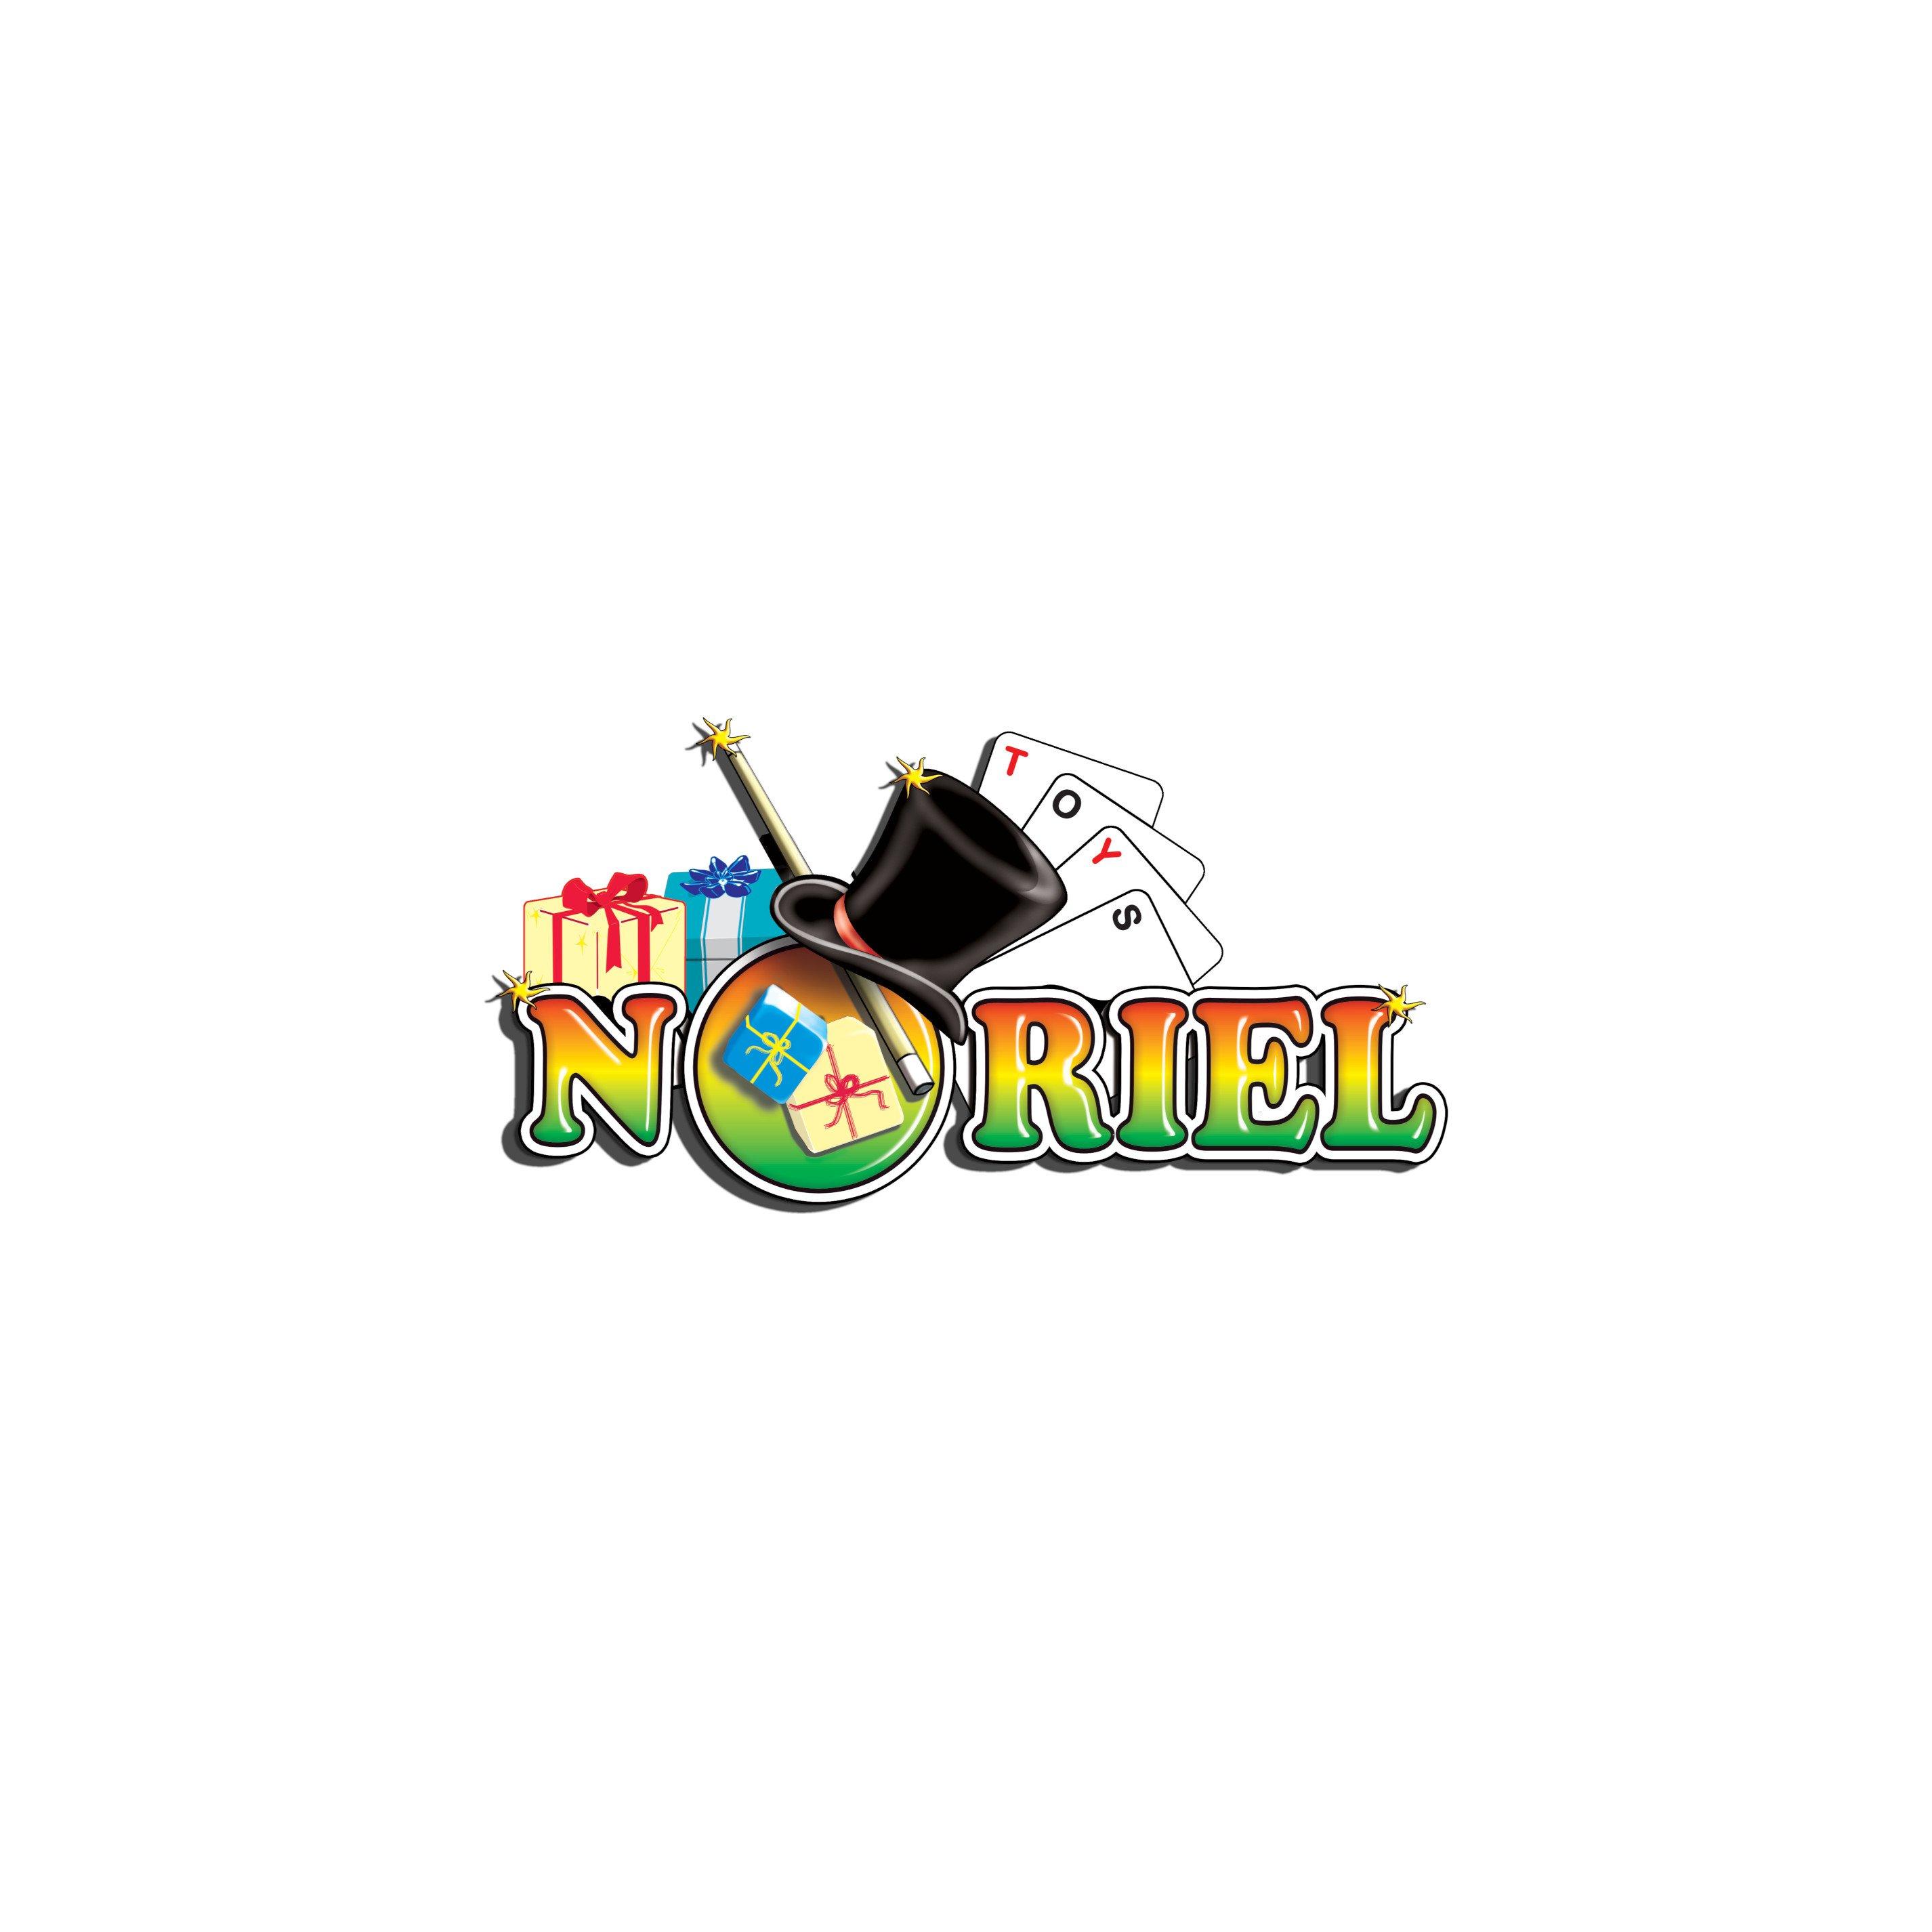 DK000562572_001w Set stickere Disney Mickey Mouse, 10 x 22 cm